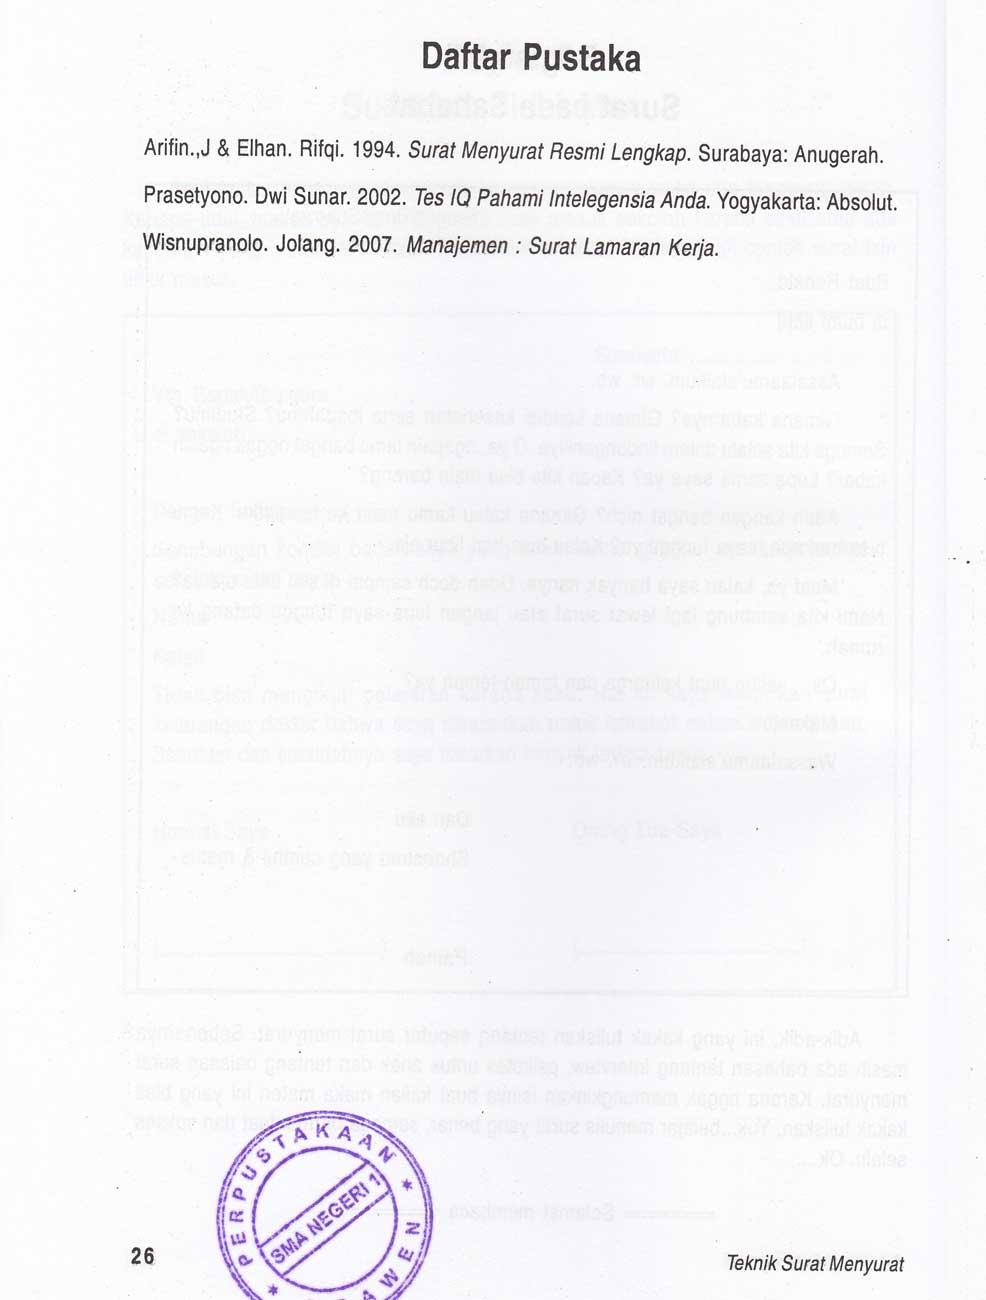 E Paper Perpustakaan Sman 1 Blora Teknik Surat Menyurat